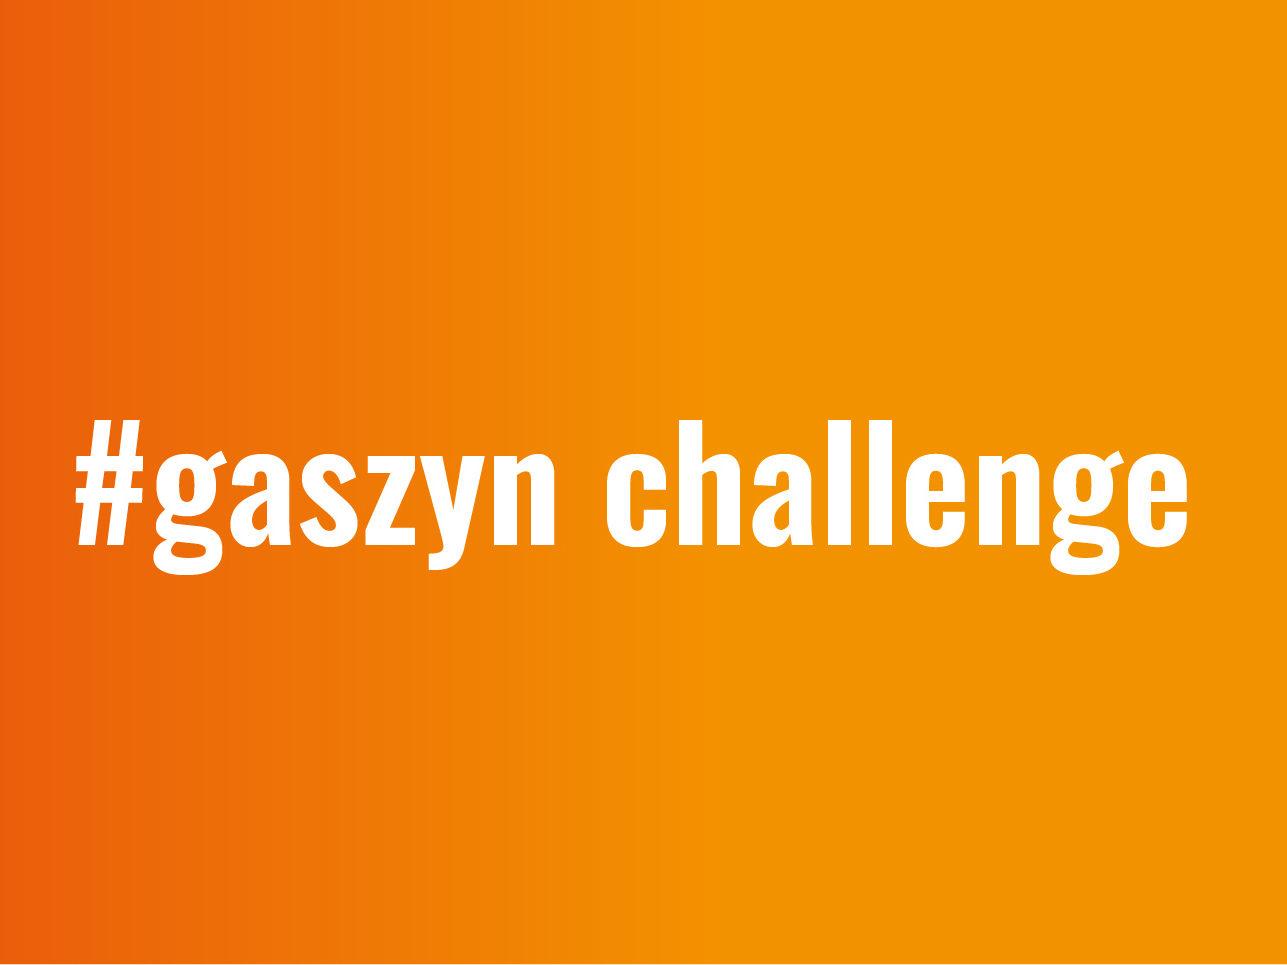 gaszyn challenge